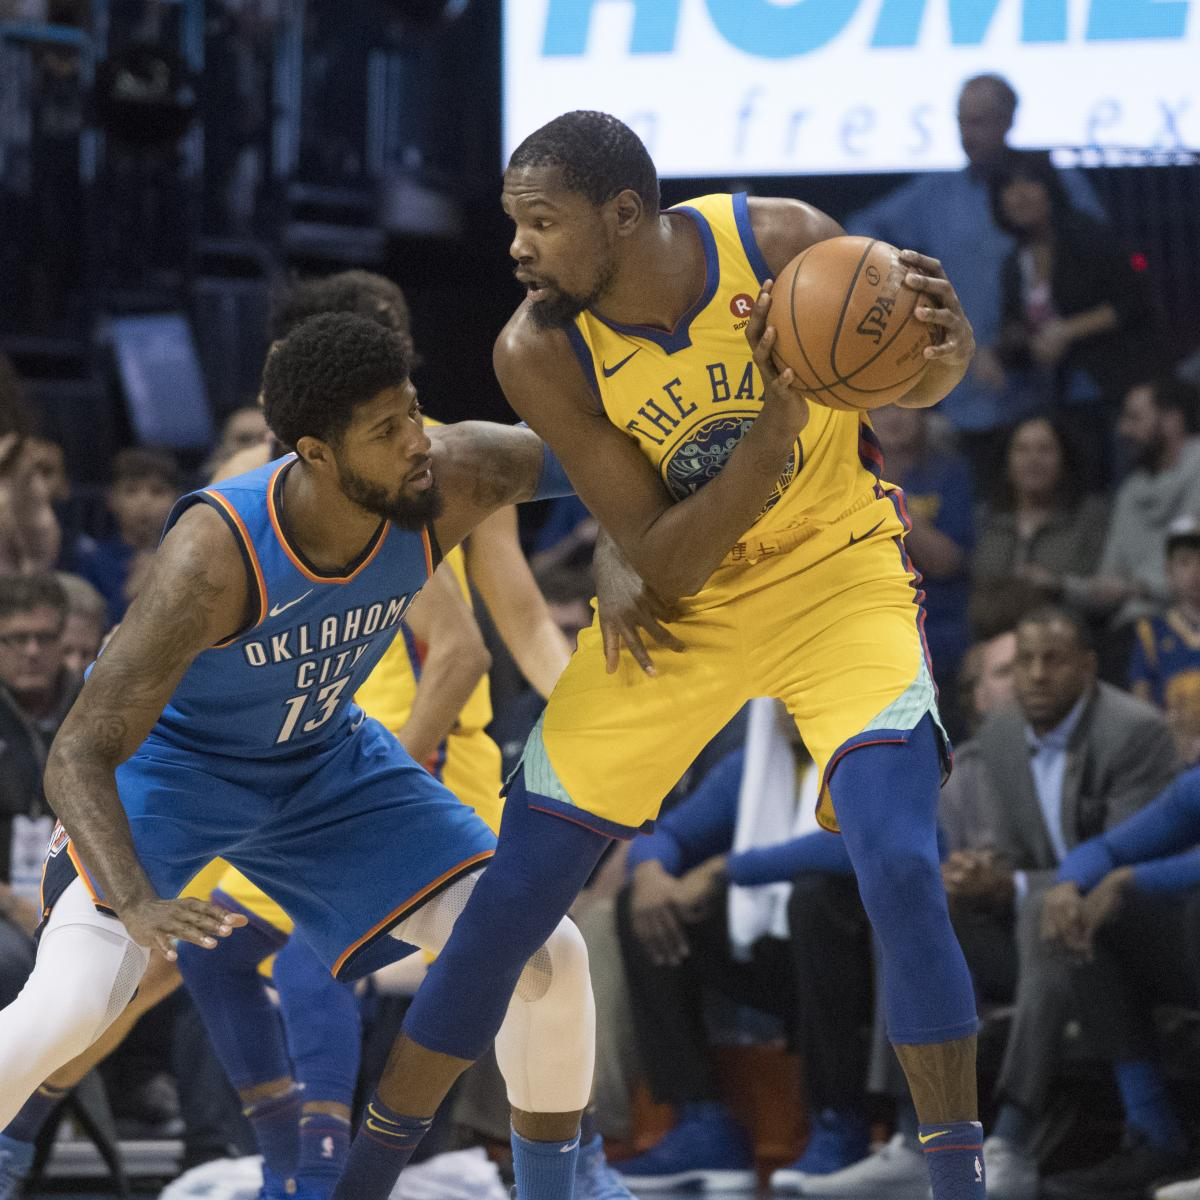 Ranking NBA's Top 15 Small Forwards Entering 2018-19 Season